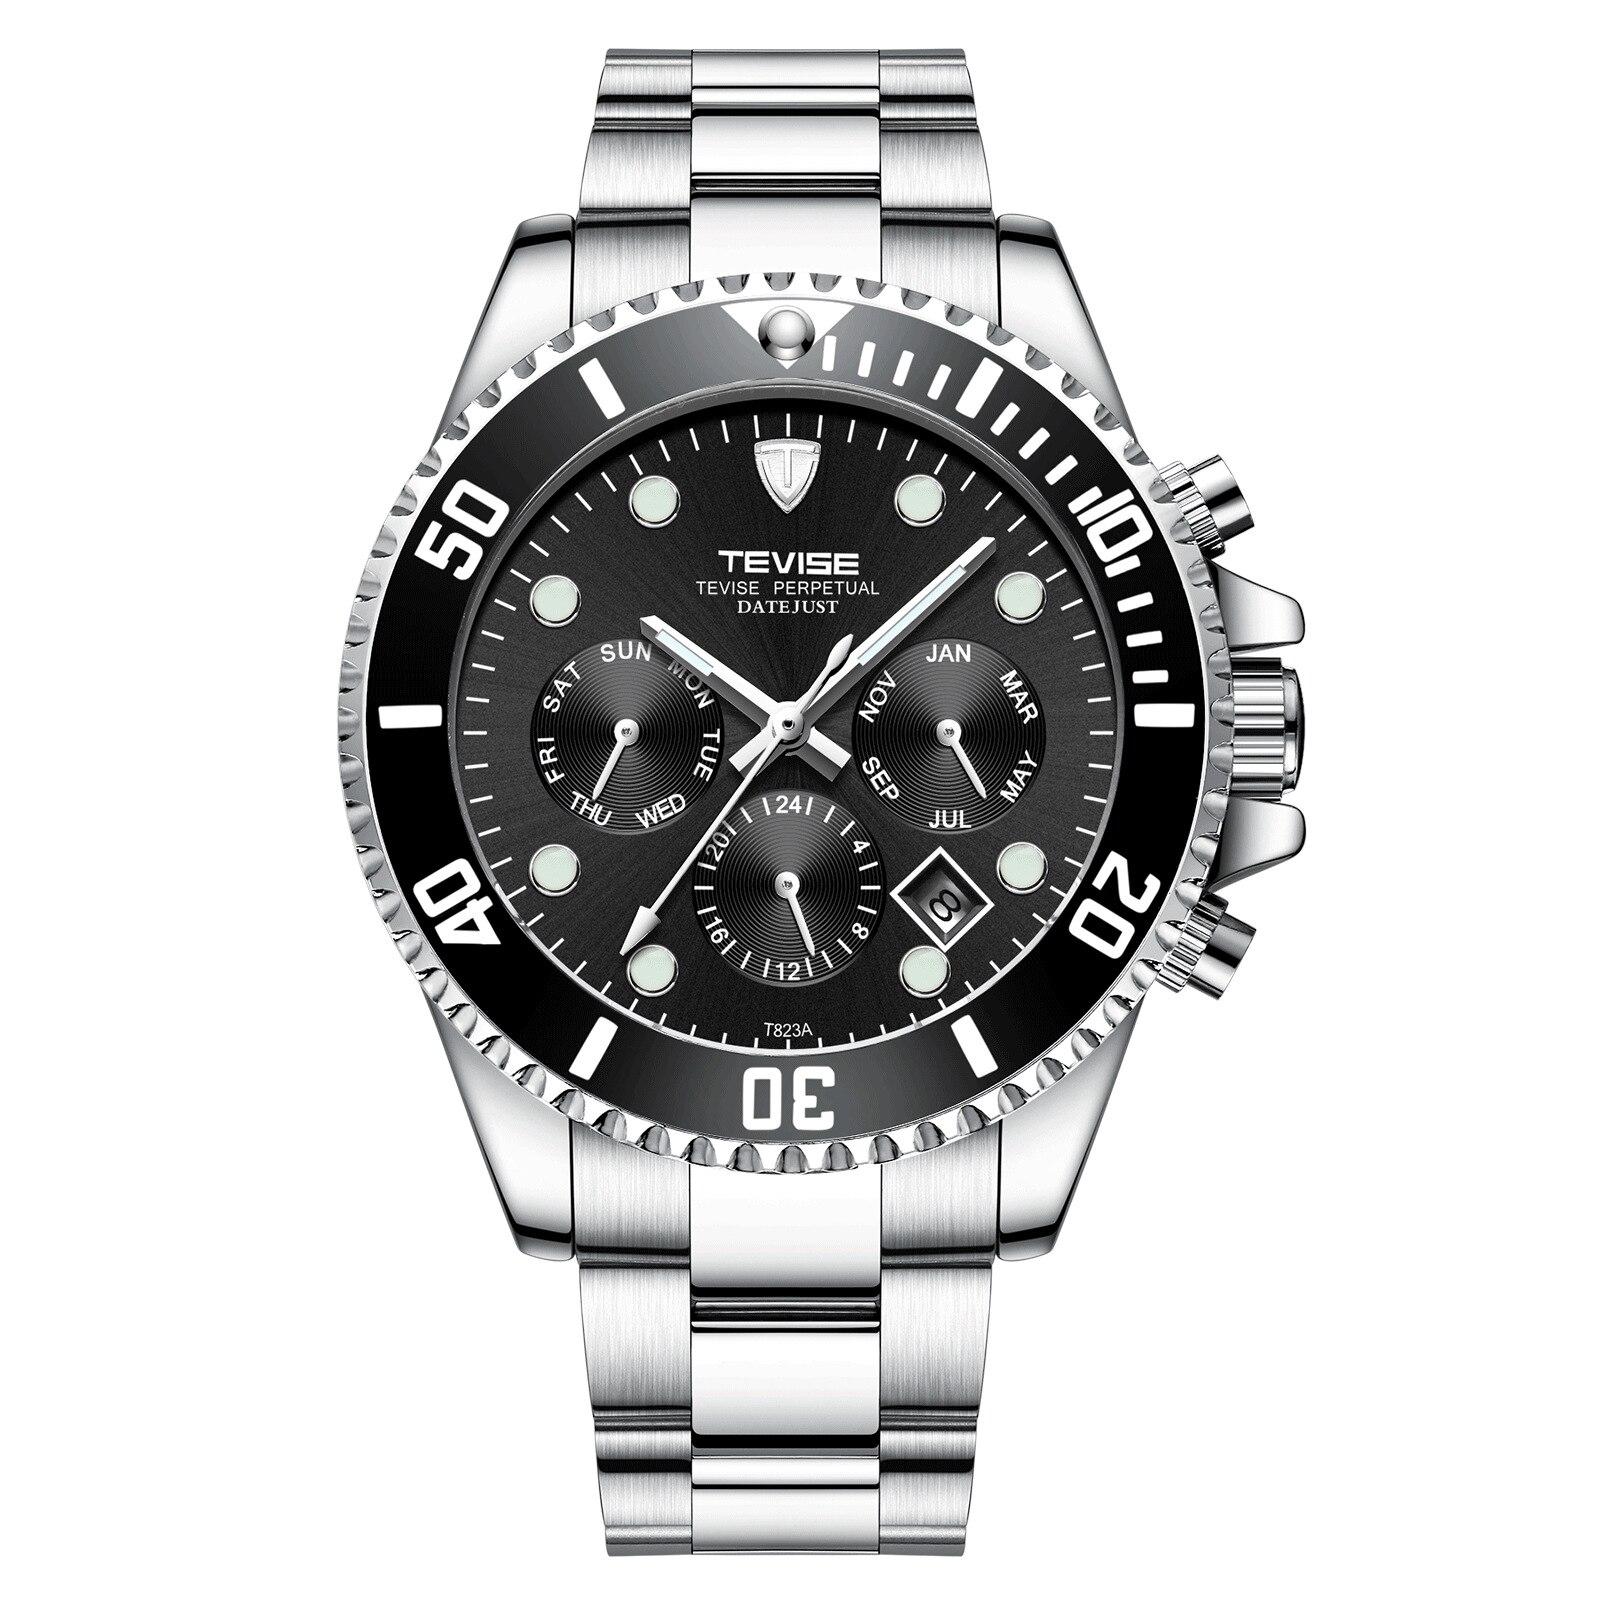 Prova D' Água Auto Enrolamento Relógios de Pulso Relogio masculino